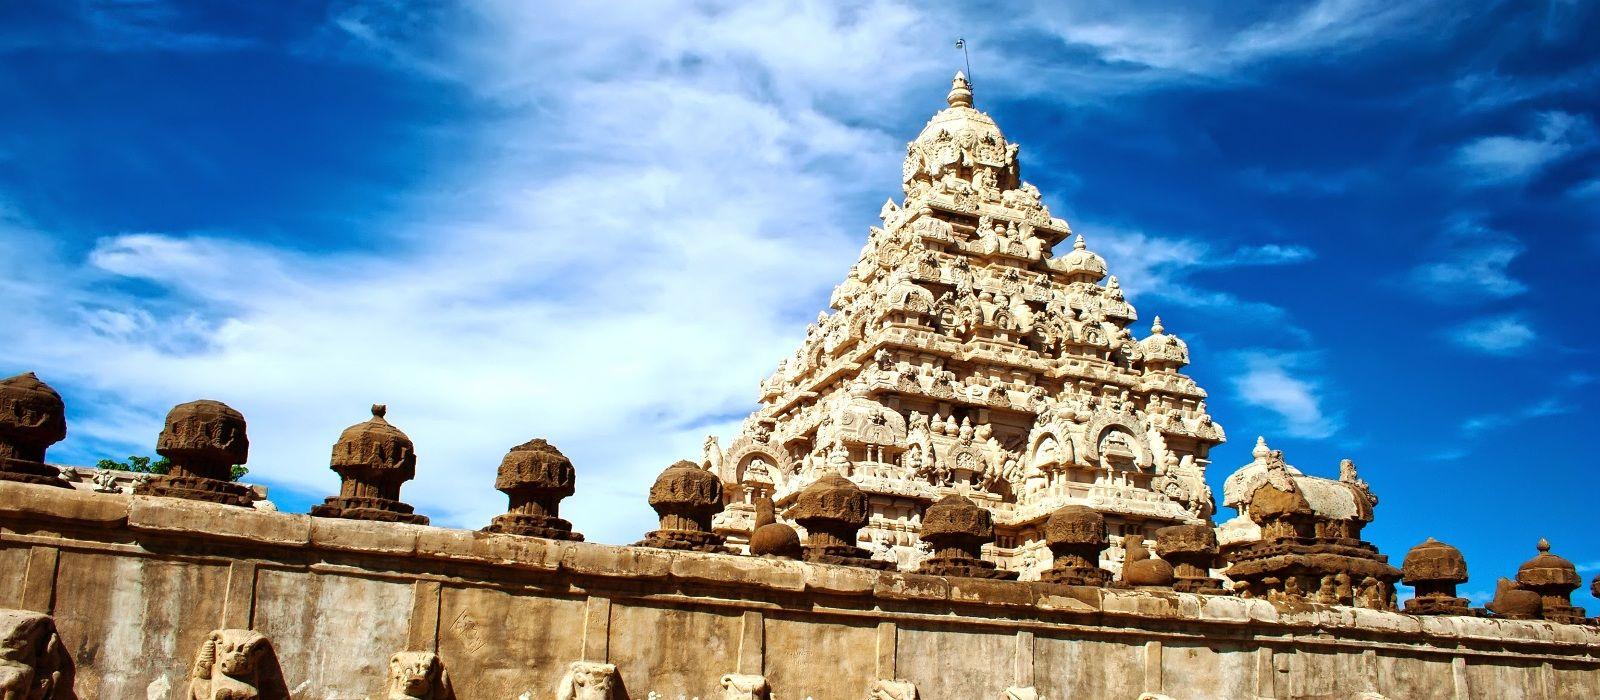 Destination Kanchipuram South India